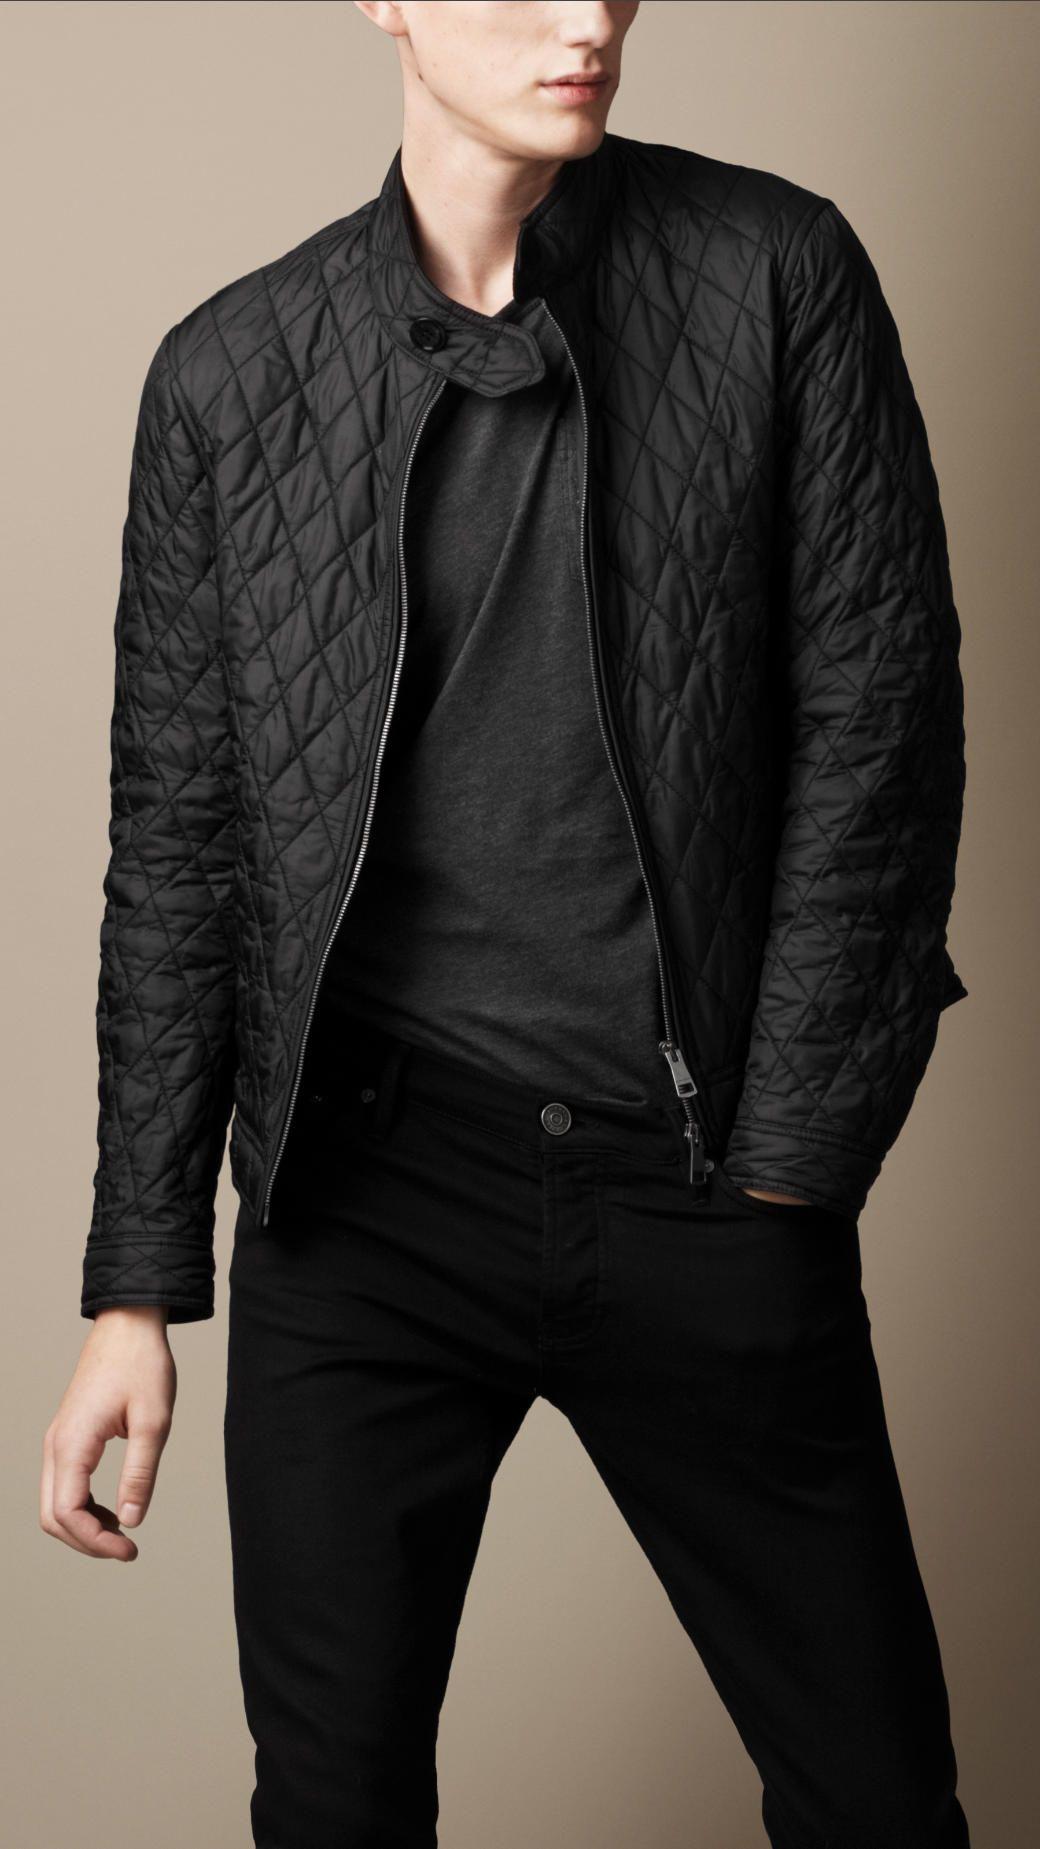 Diamond Quilted Harrington Jacket Burberry Veste